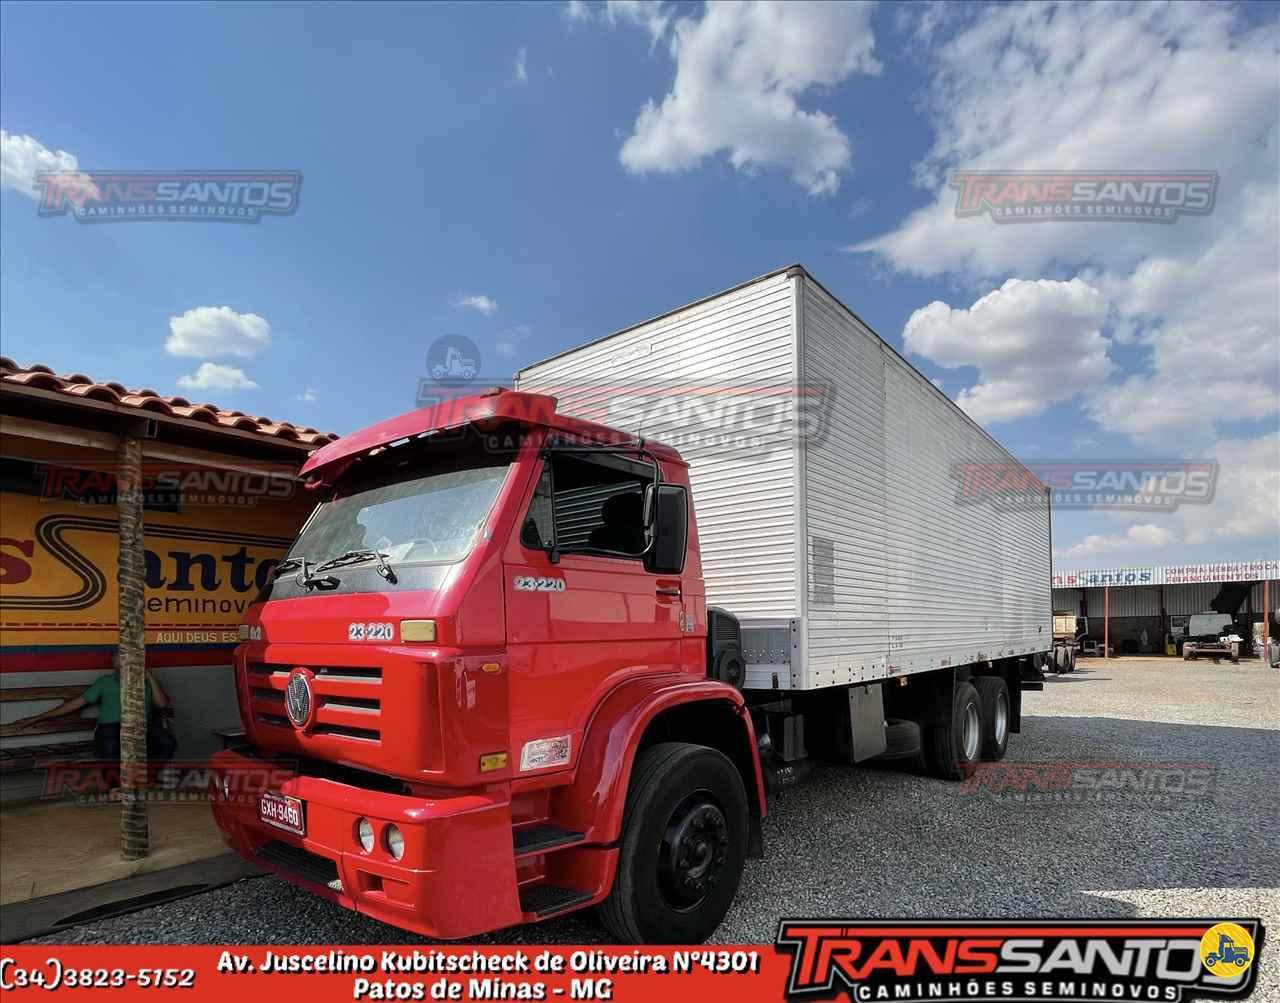 CAMINHAO VOLKSWAGEN VW 23220 Chassis Truck 6x2 TransSantos Seminovos PATOS DE MINAS MINAS GERAIS MG